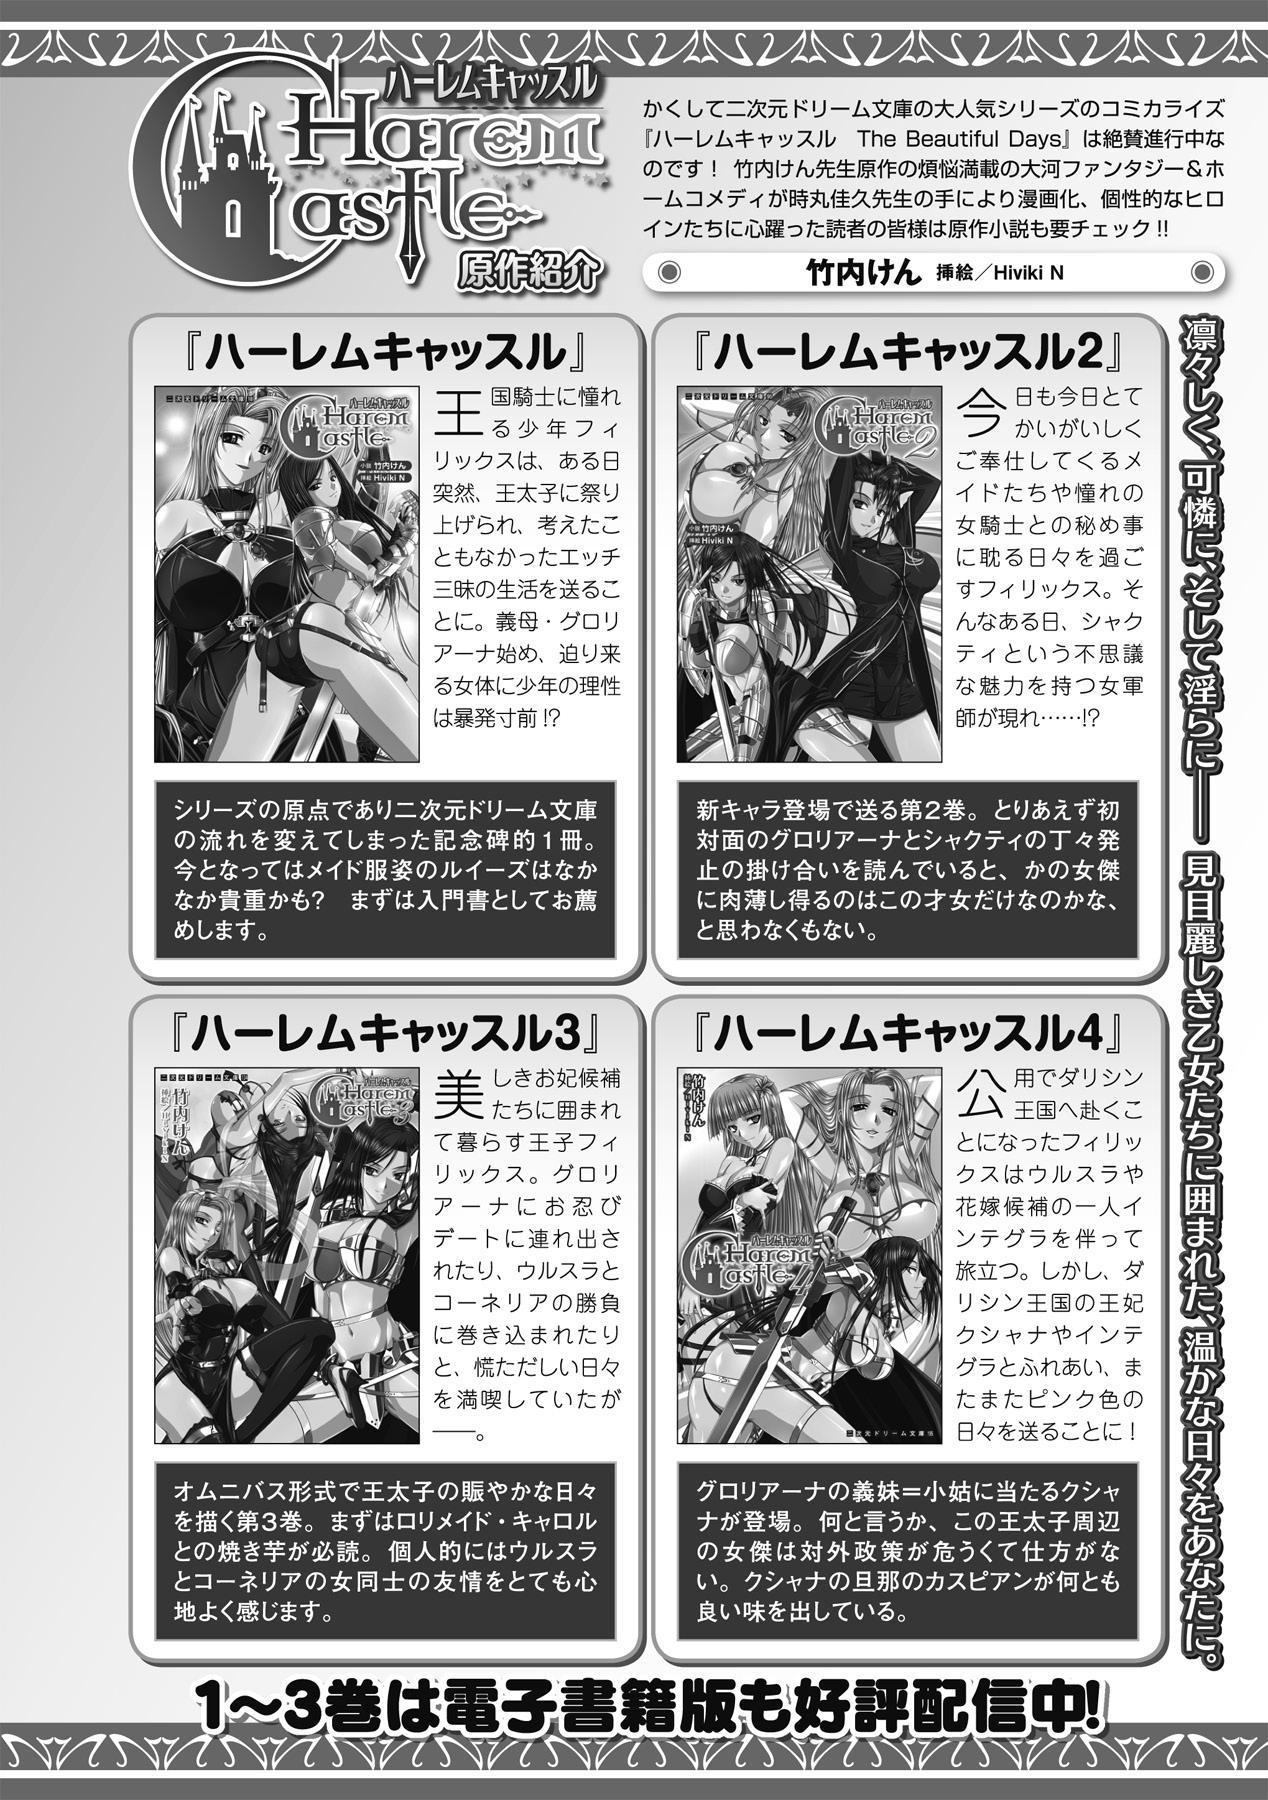 Megami Crisis 1 102